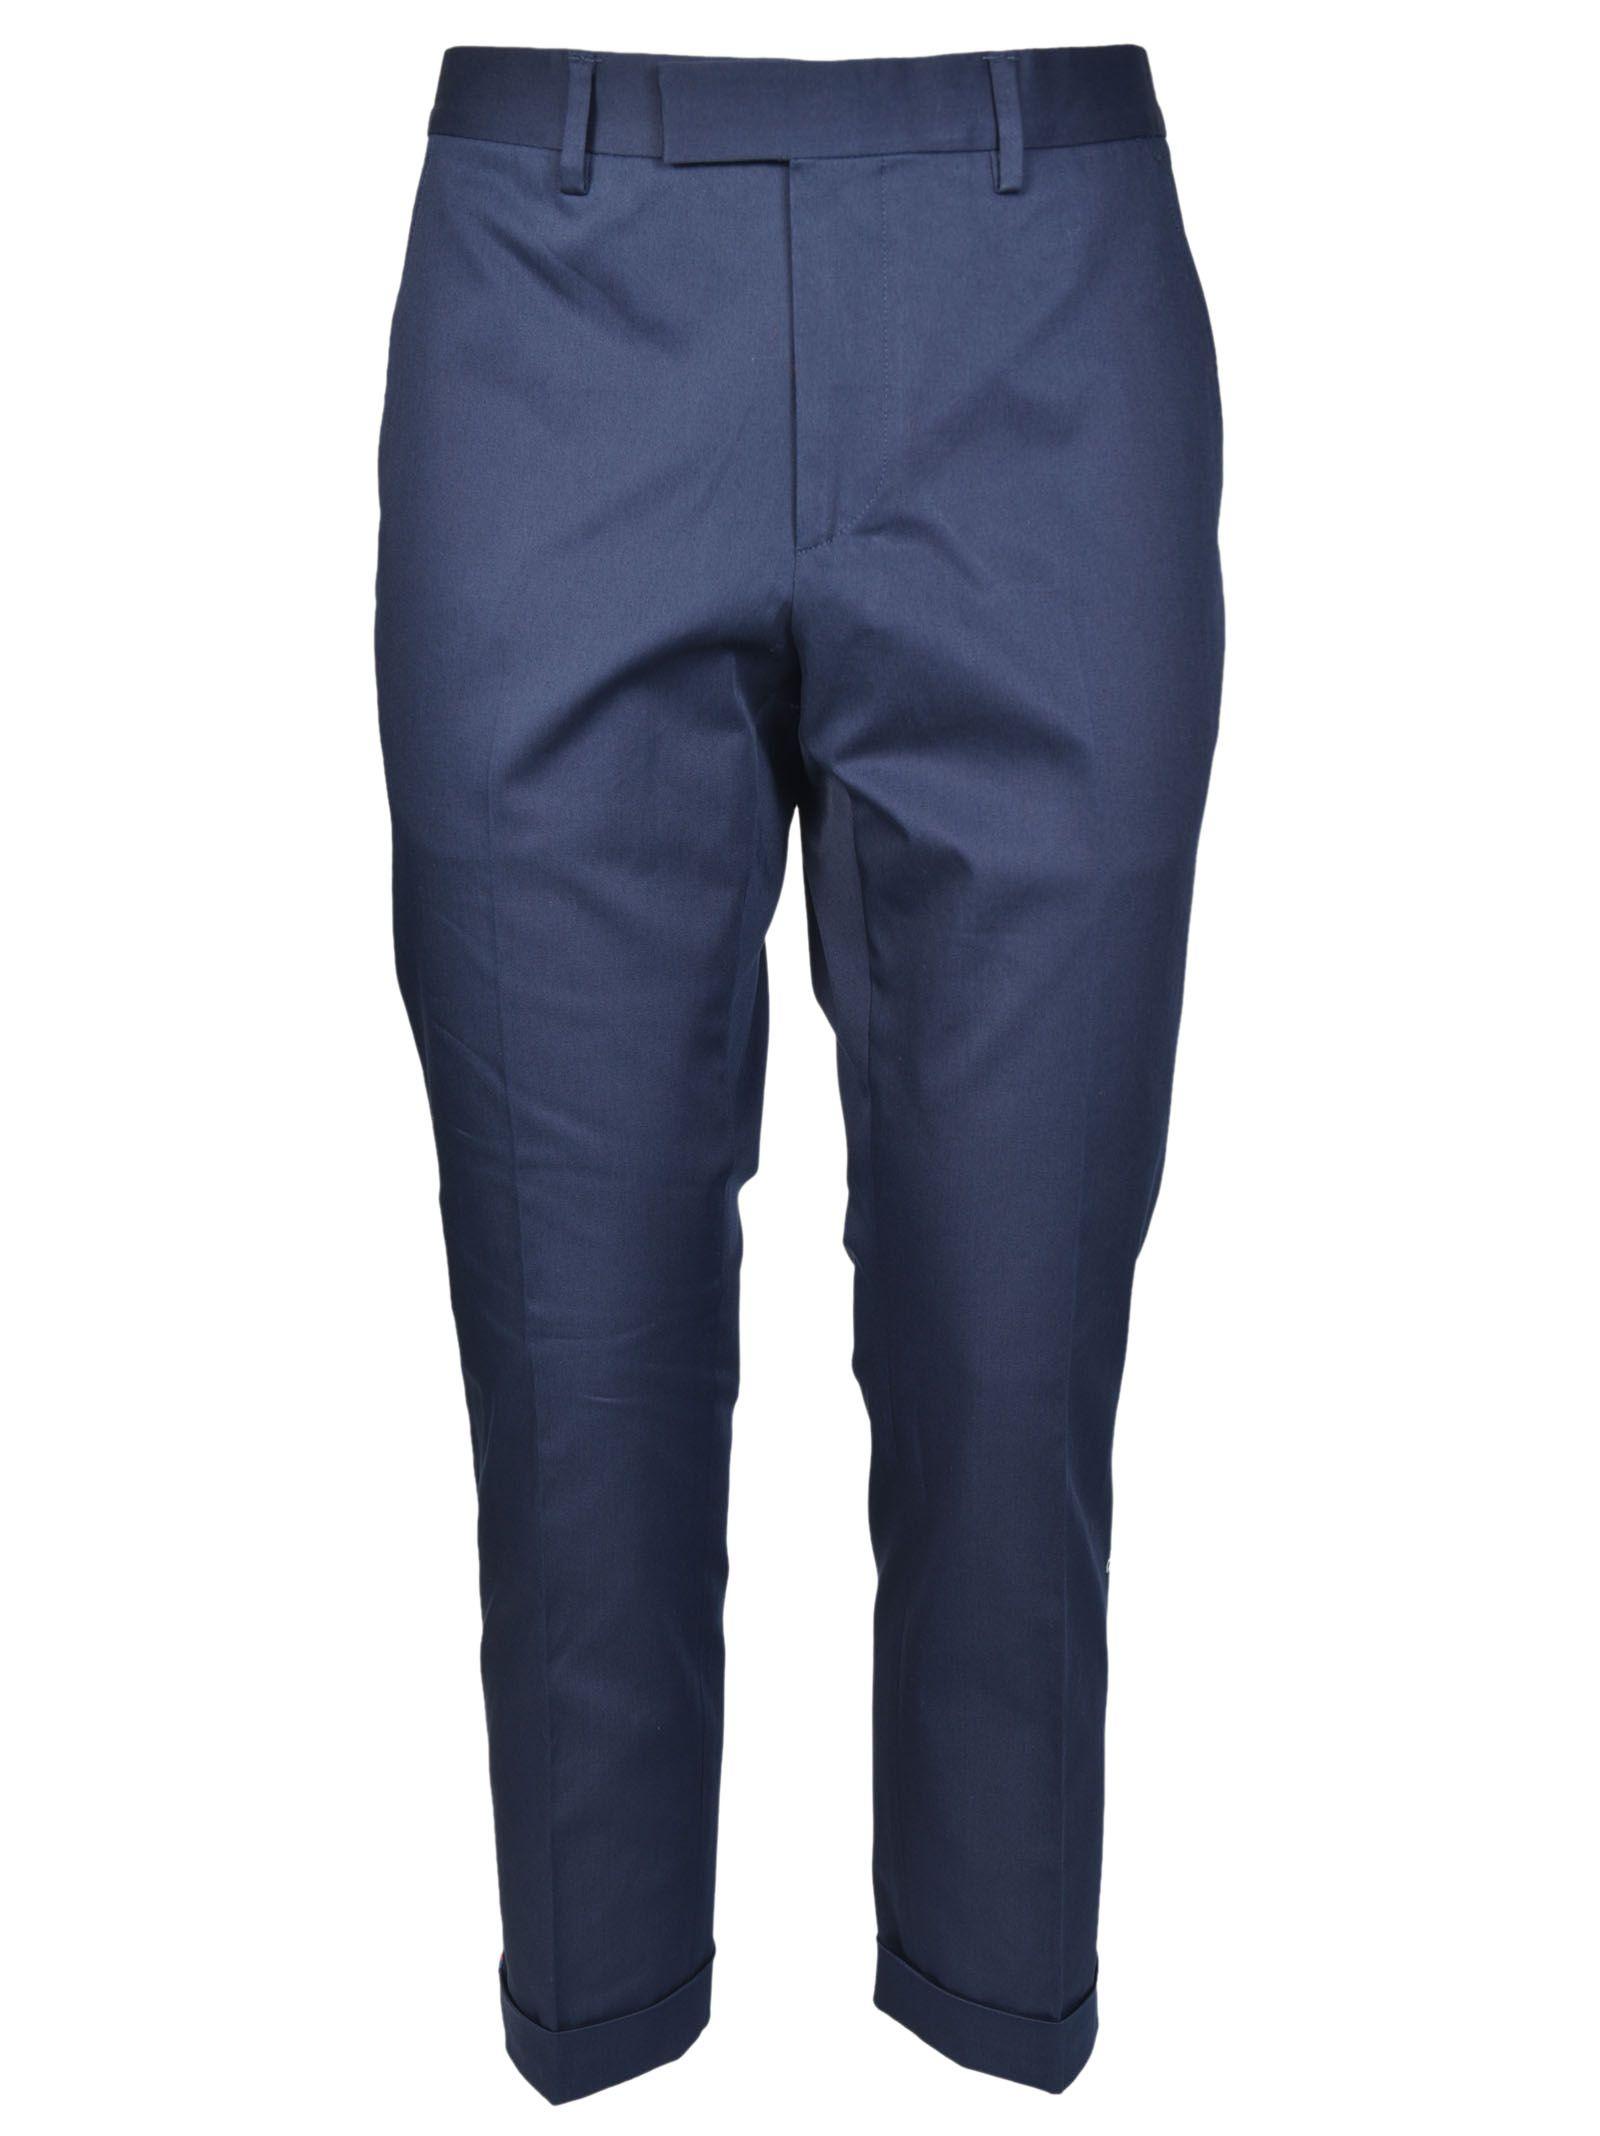 Gucci Slim Fit Trousers